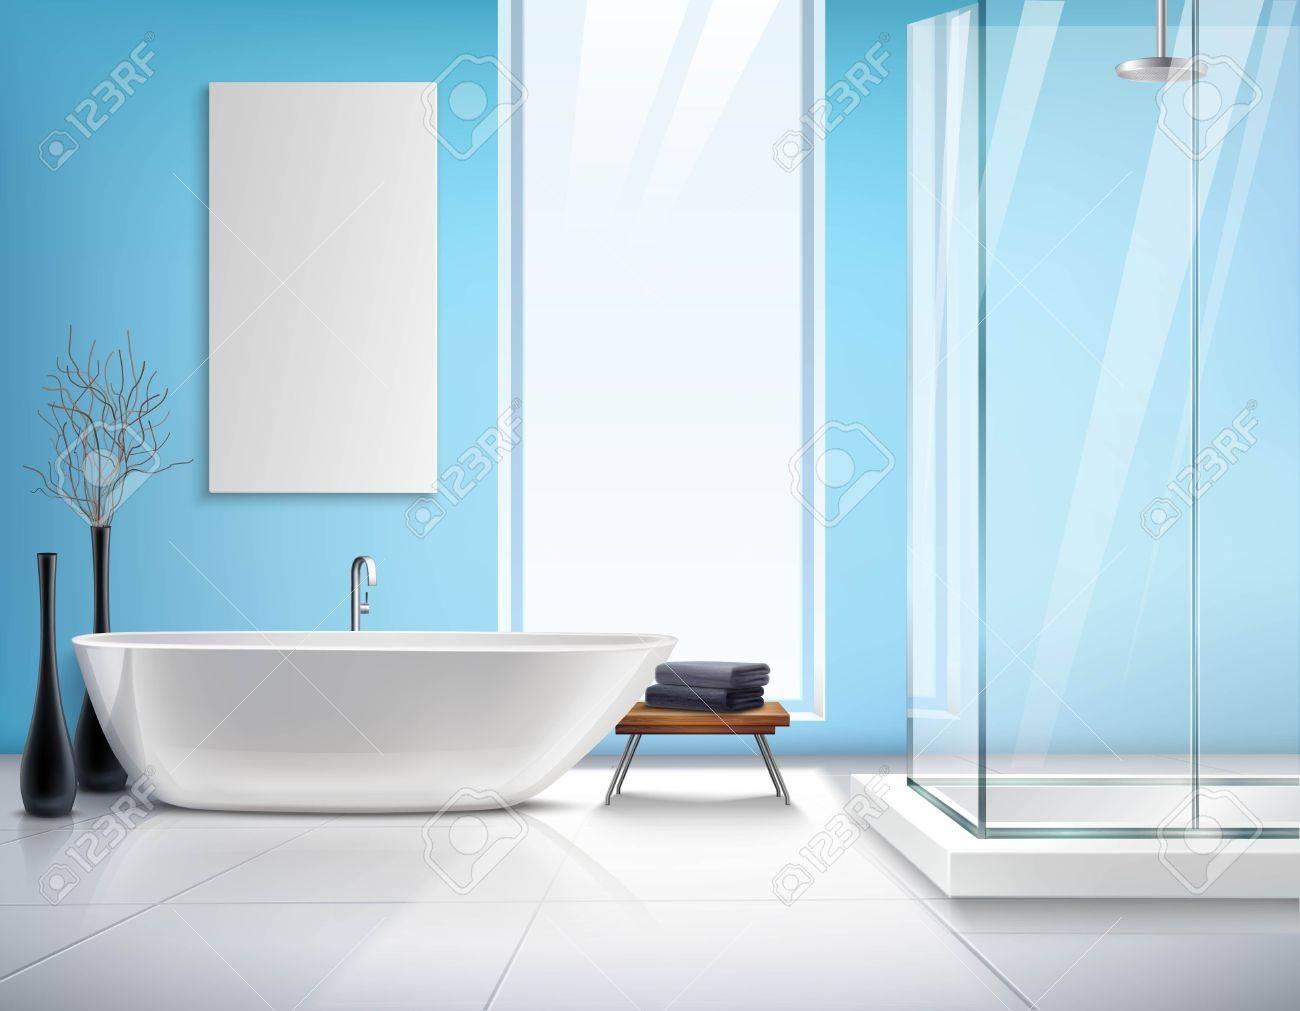 Modern Light Bathroom Realistic Interior Design With White Bath ...